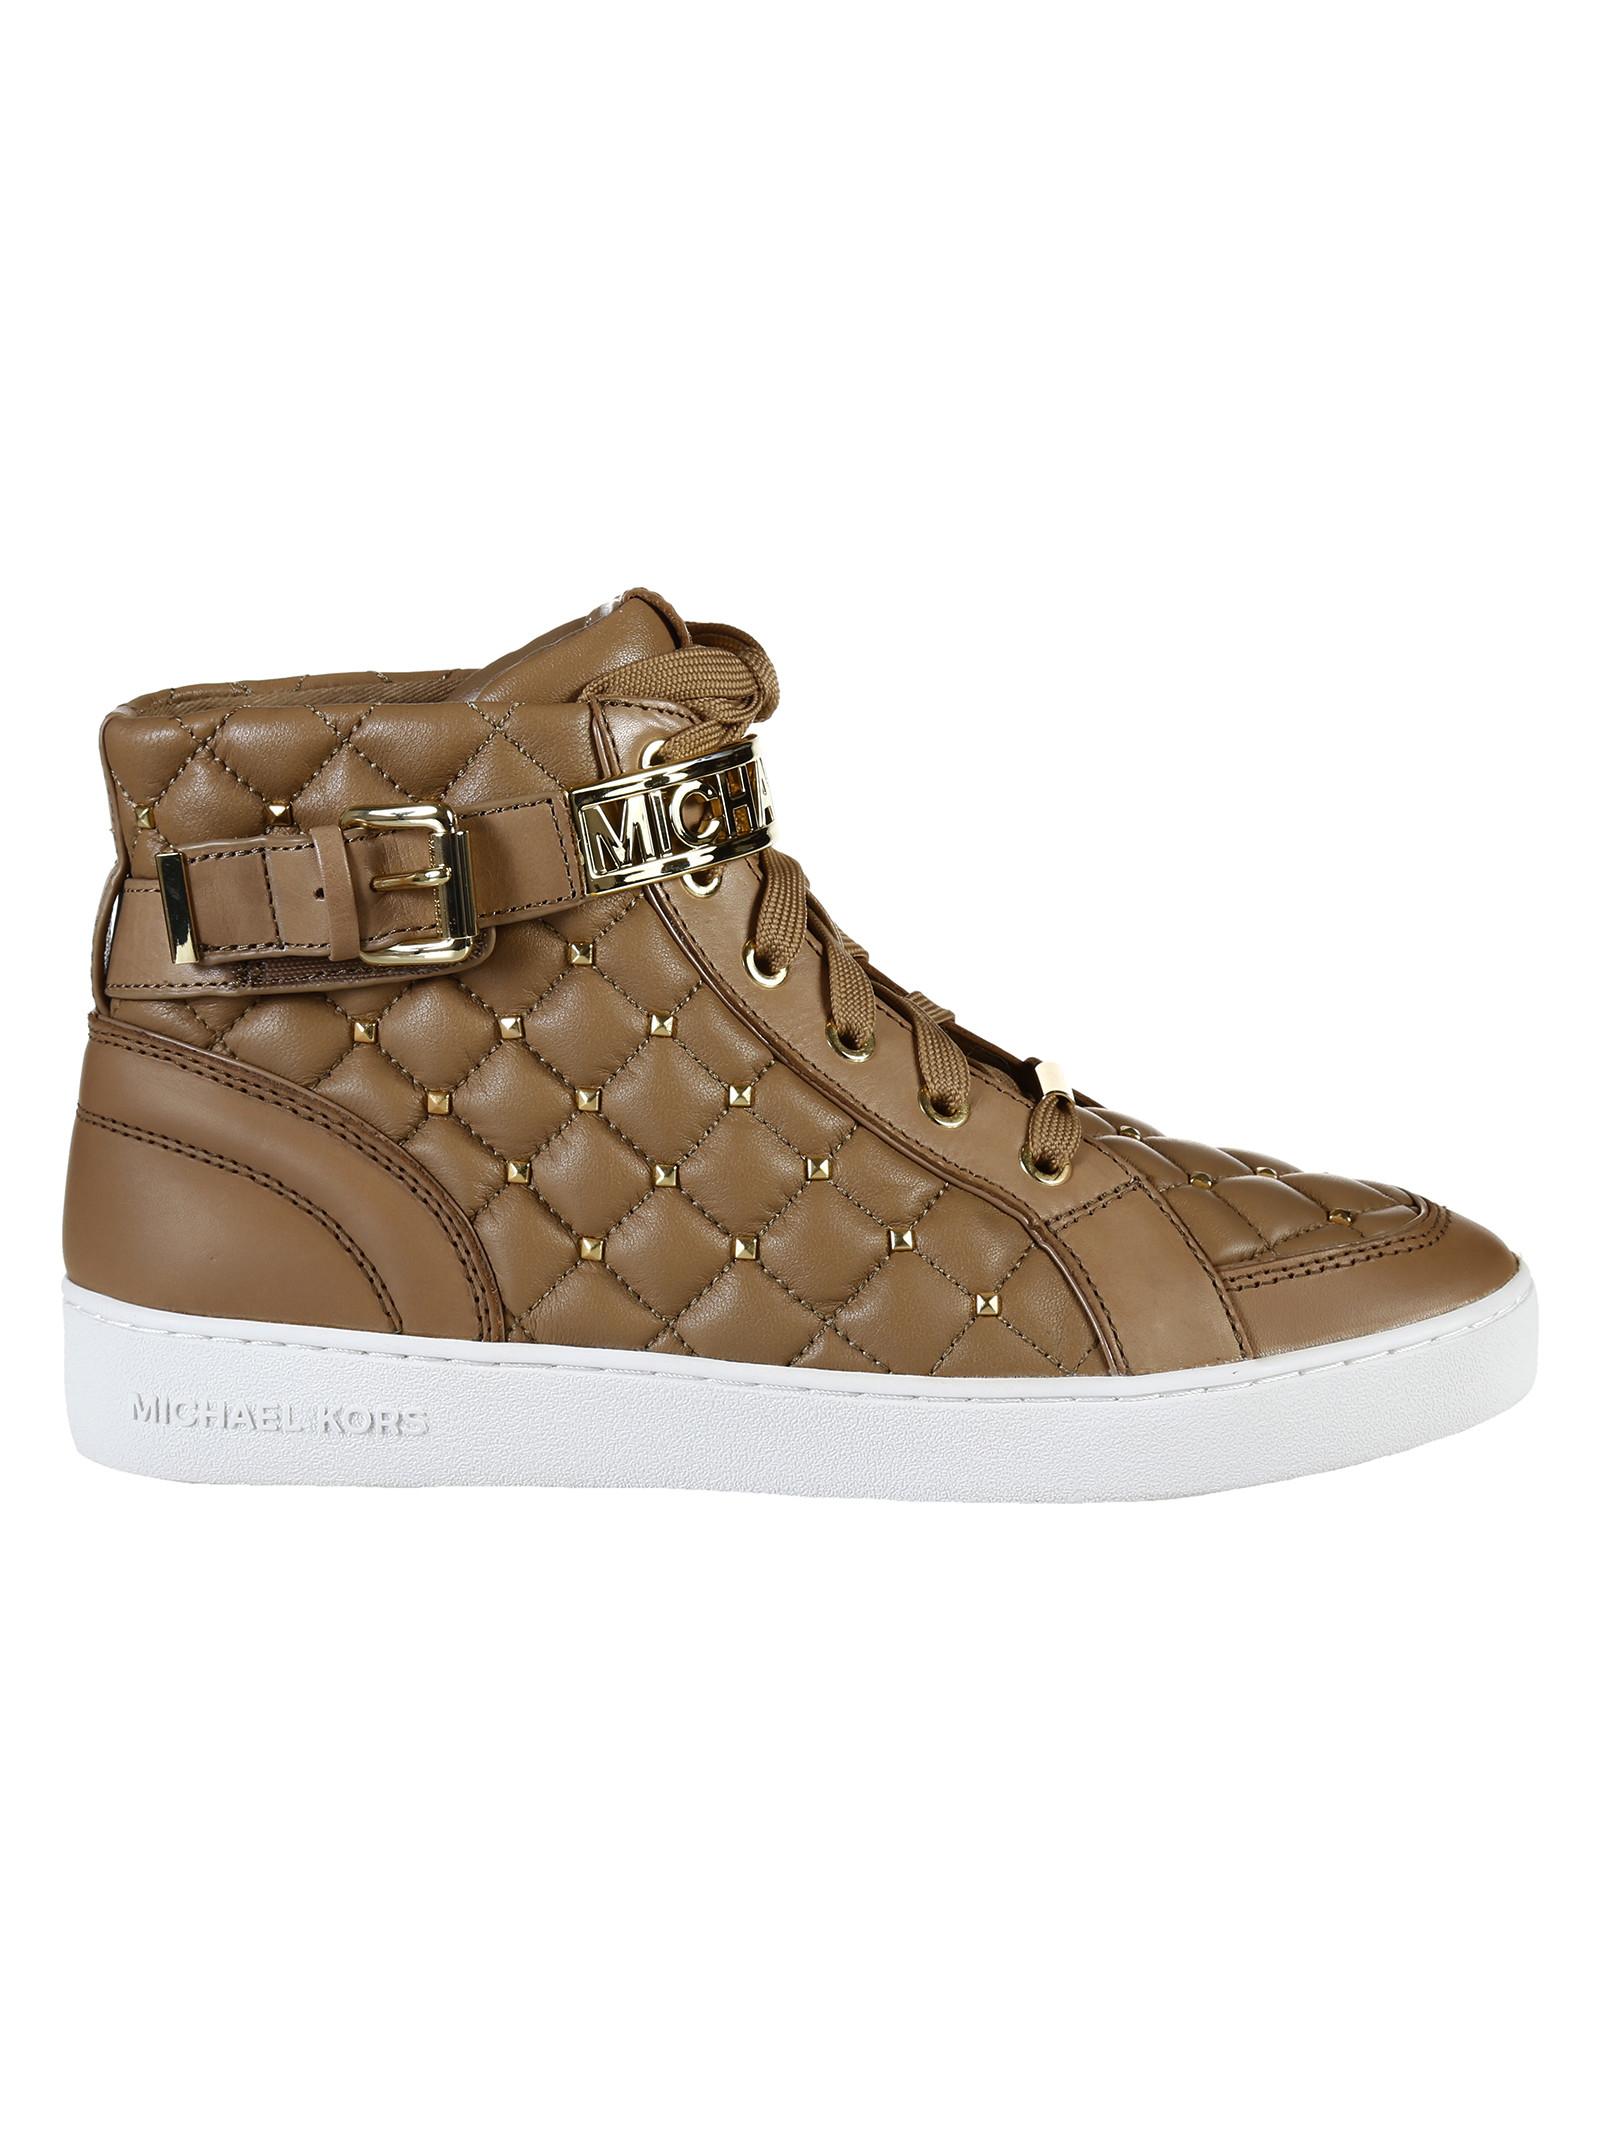 michael kors sneaker essex high top in brown kaki lyst. Black Bedroom Furniture Sets. Home Design Ideas